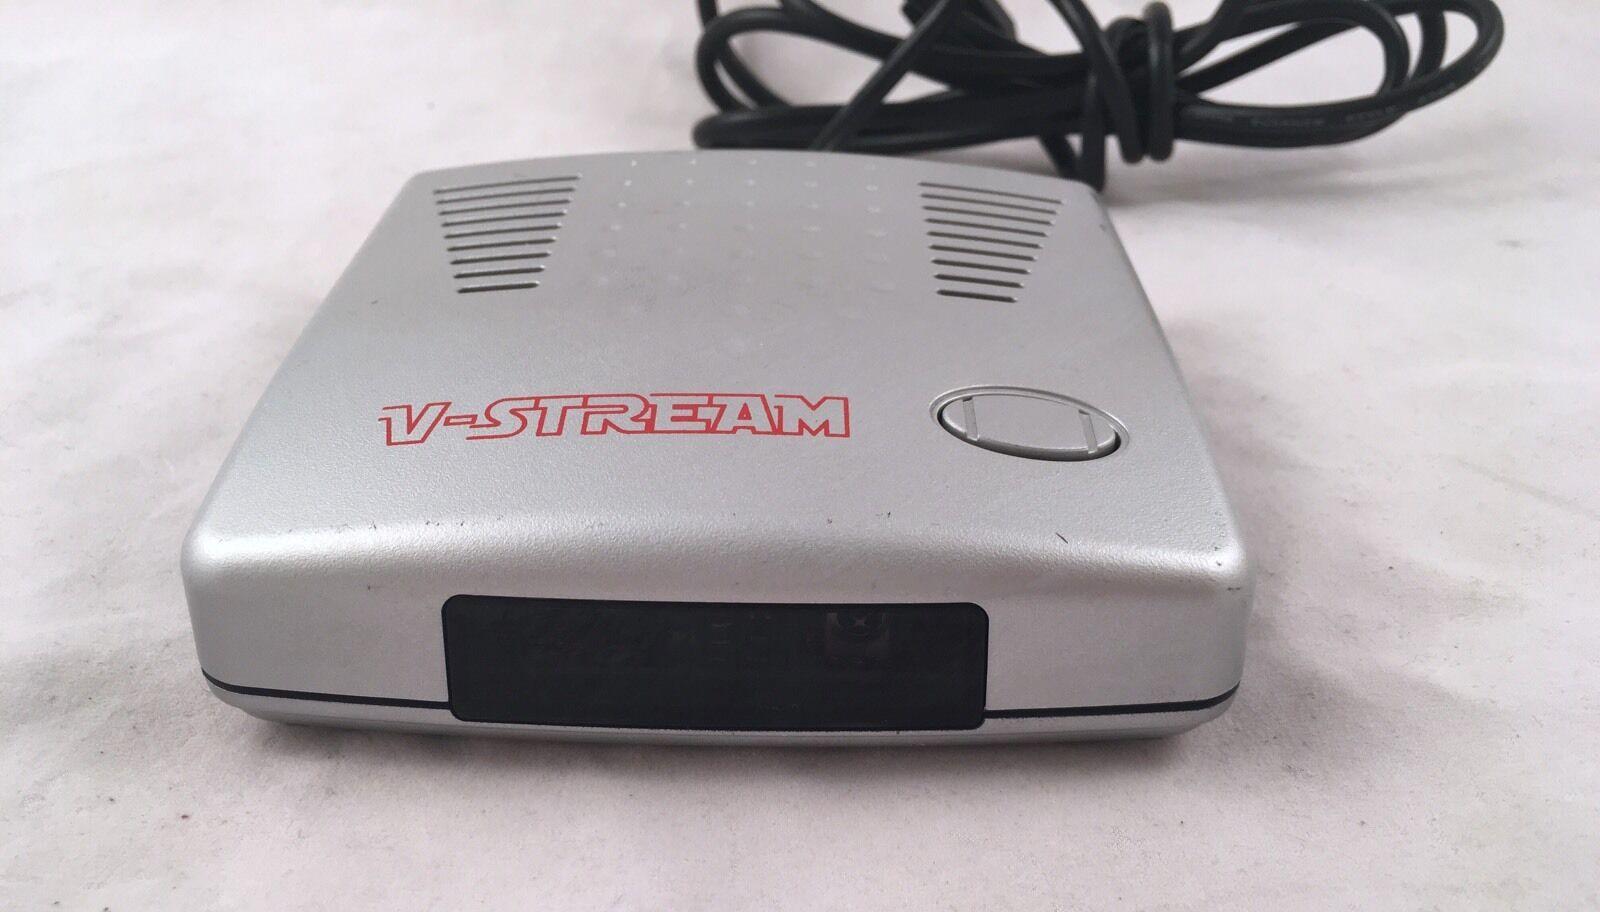 V-STREAM VS-TVUSB2800RF WINDOWS 7 DRIVER